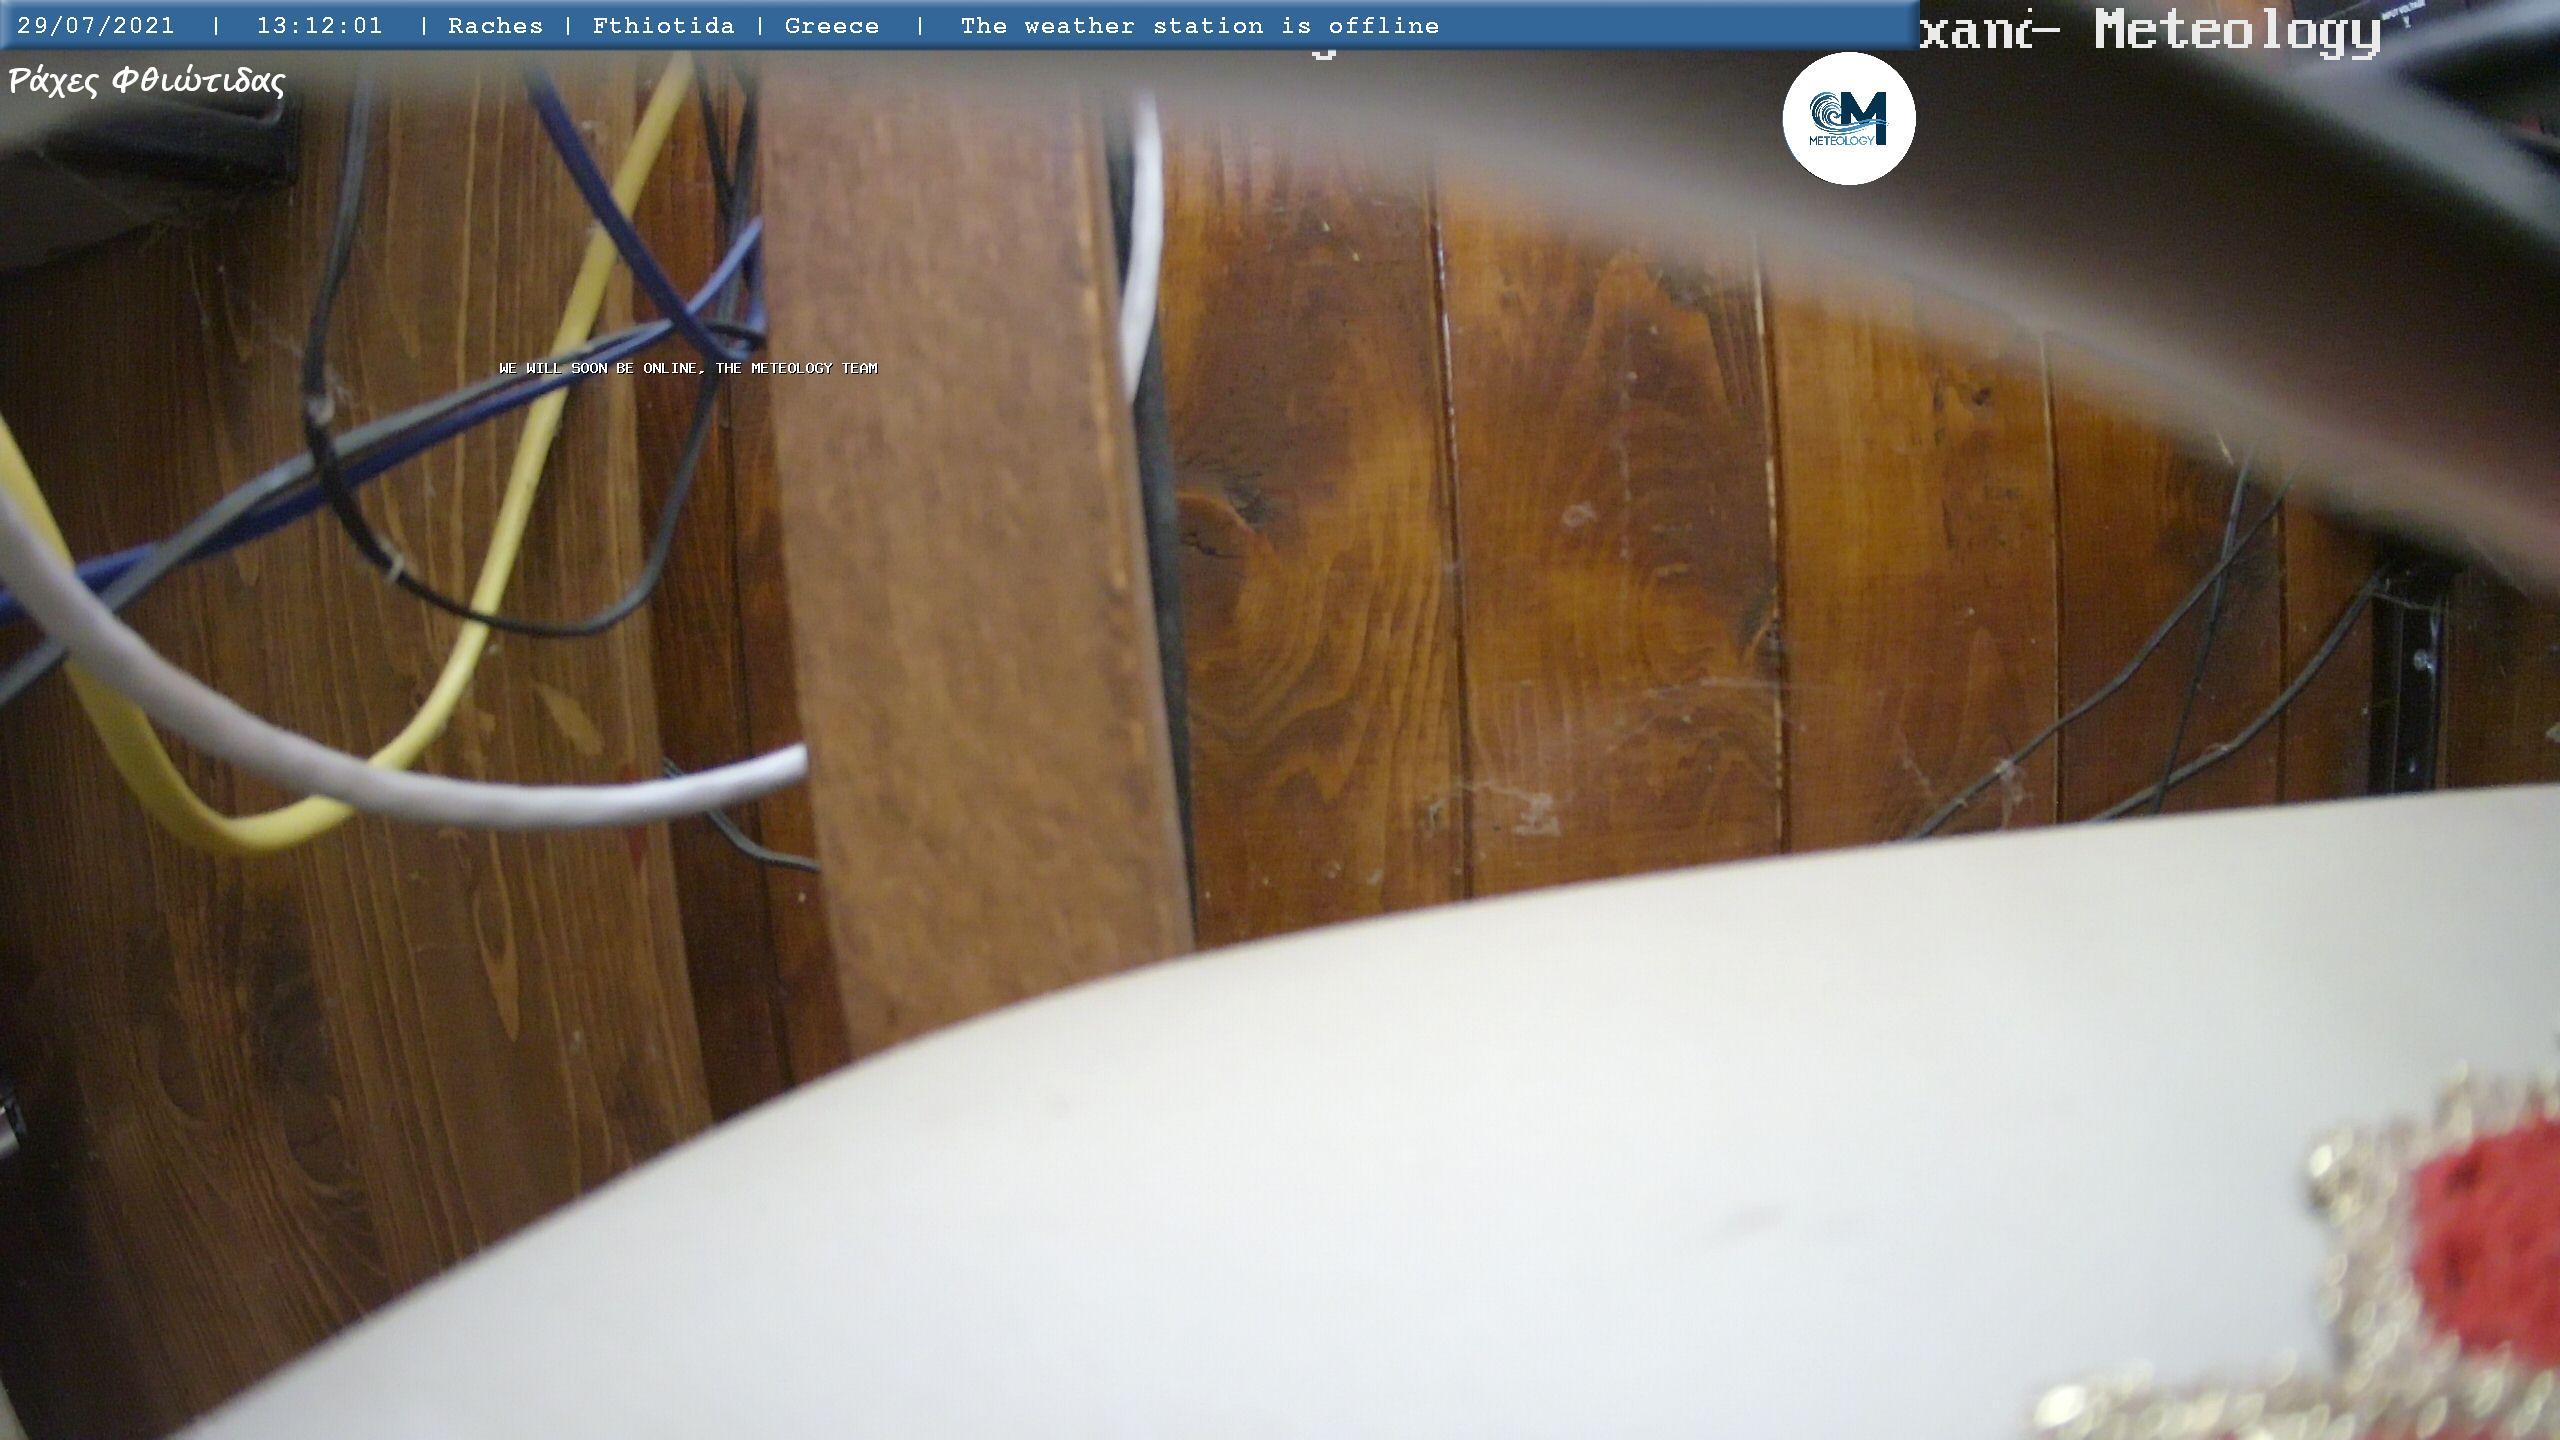 Webcam Ράχες Φθιώτιδας 2